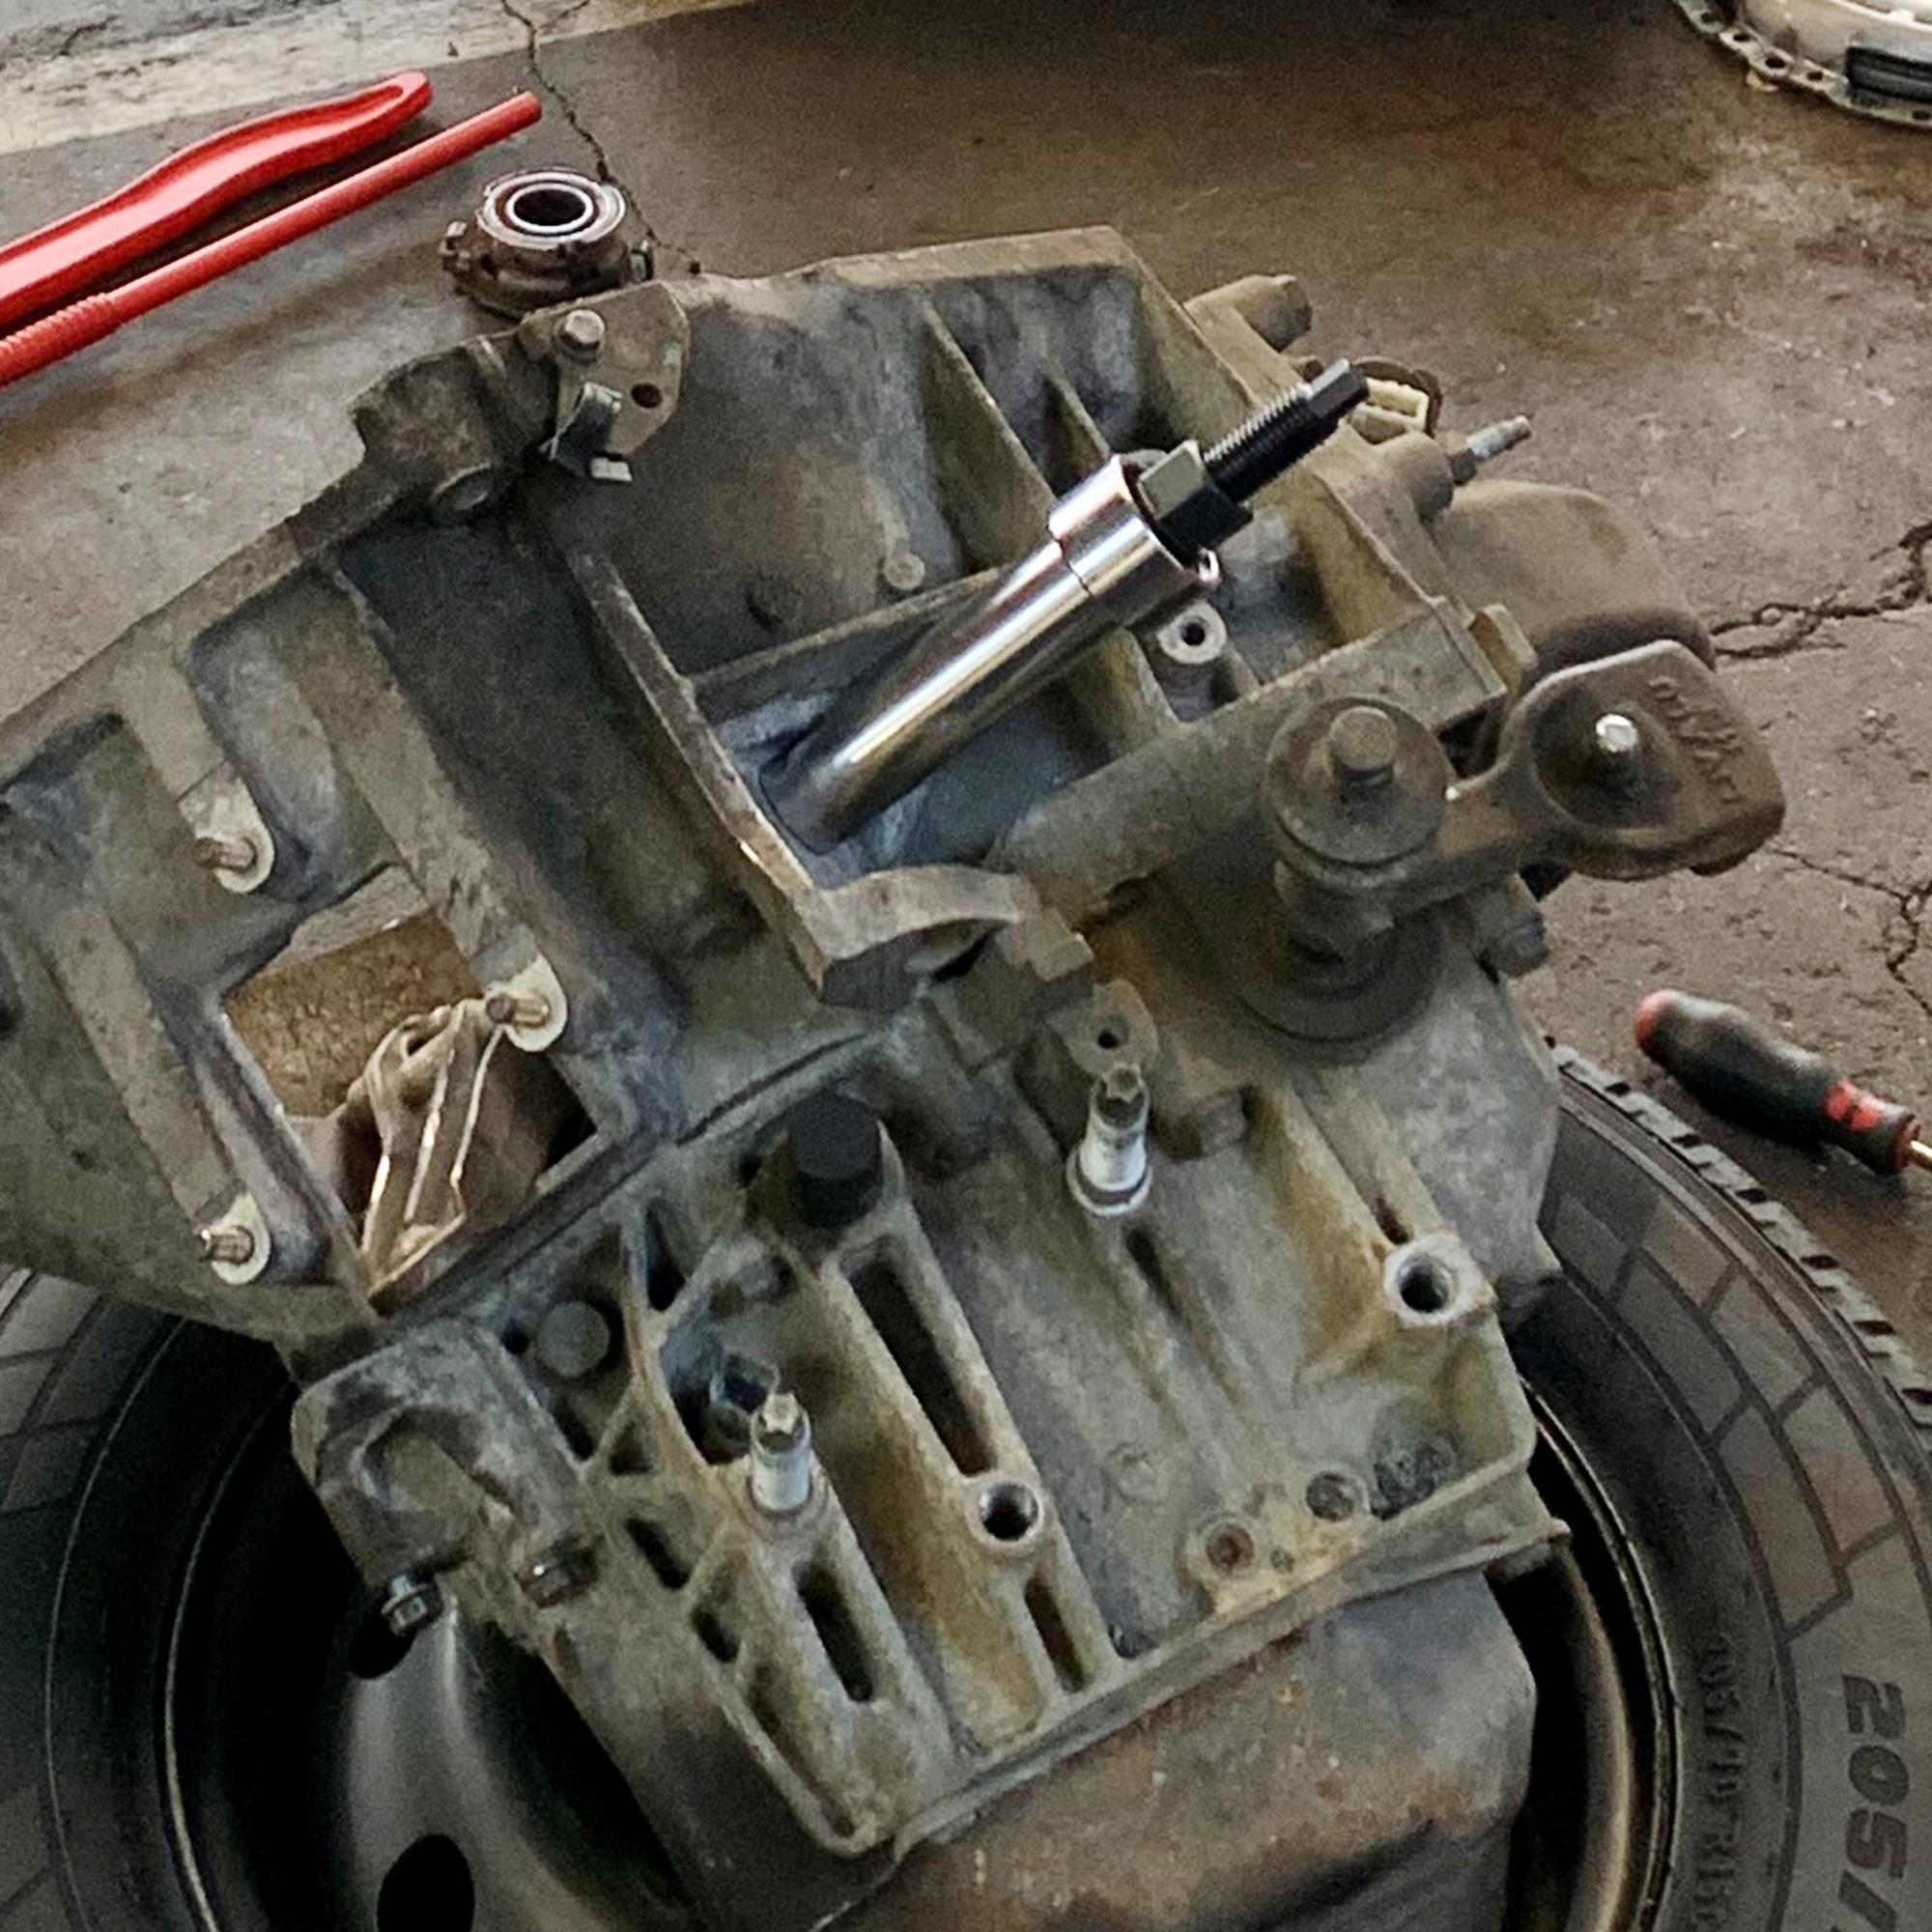 Ausruckwelle Abzieher Fur Fiat Ducato Citroen Jumper Peugeot Boxer Kupplung Kupplung Getriebe Spezialwerkzeug Xxl Automotive